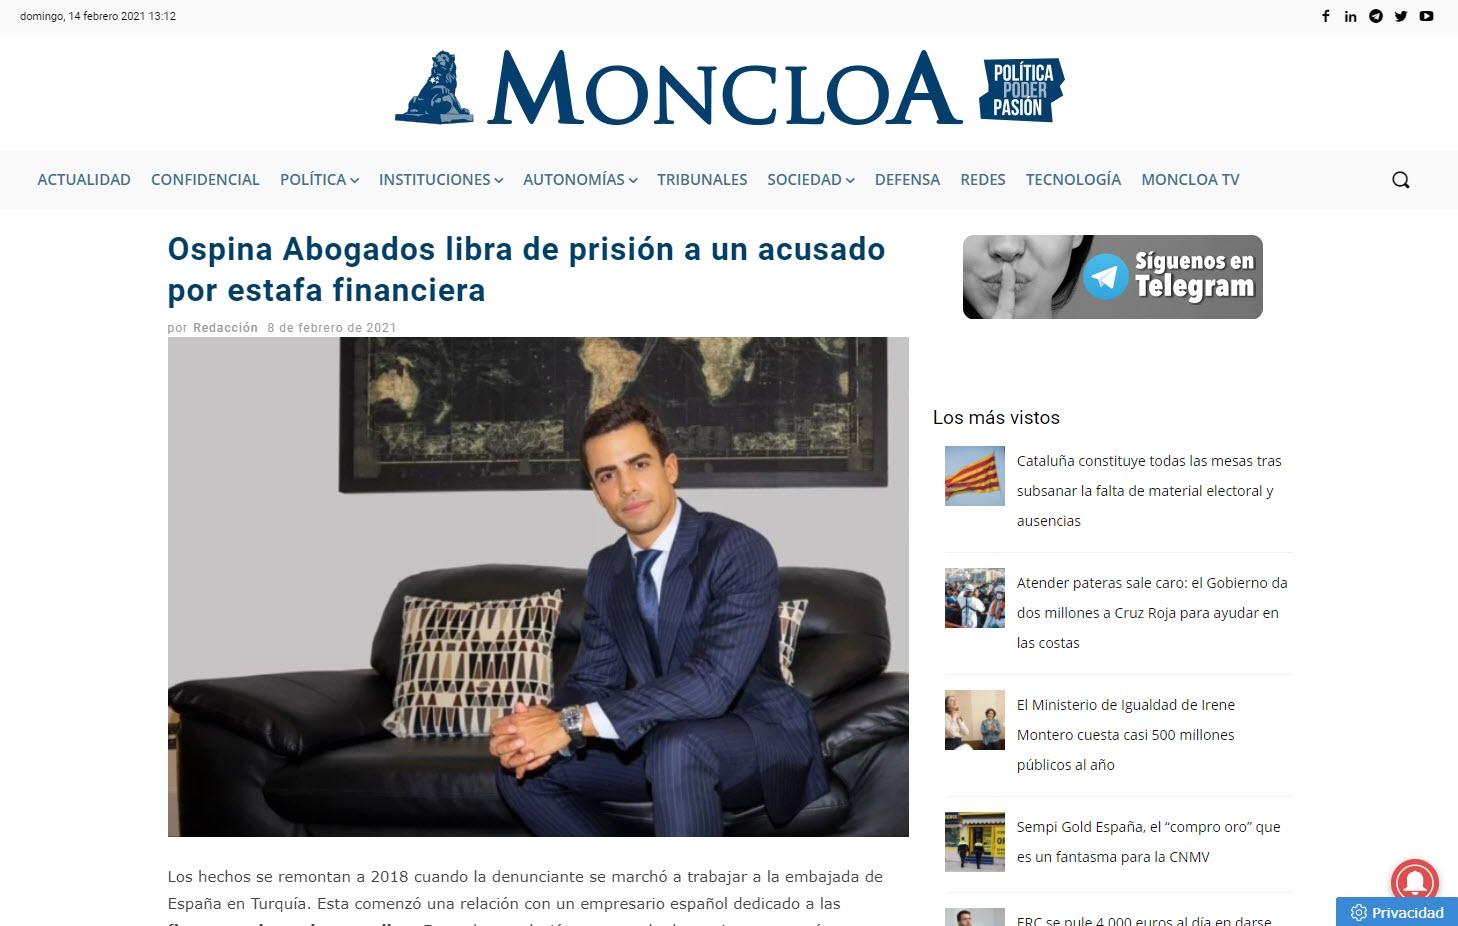 Ospina Abogados libra de prisión a un acusado por estafa financiera